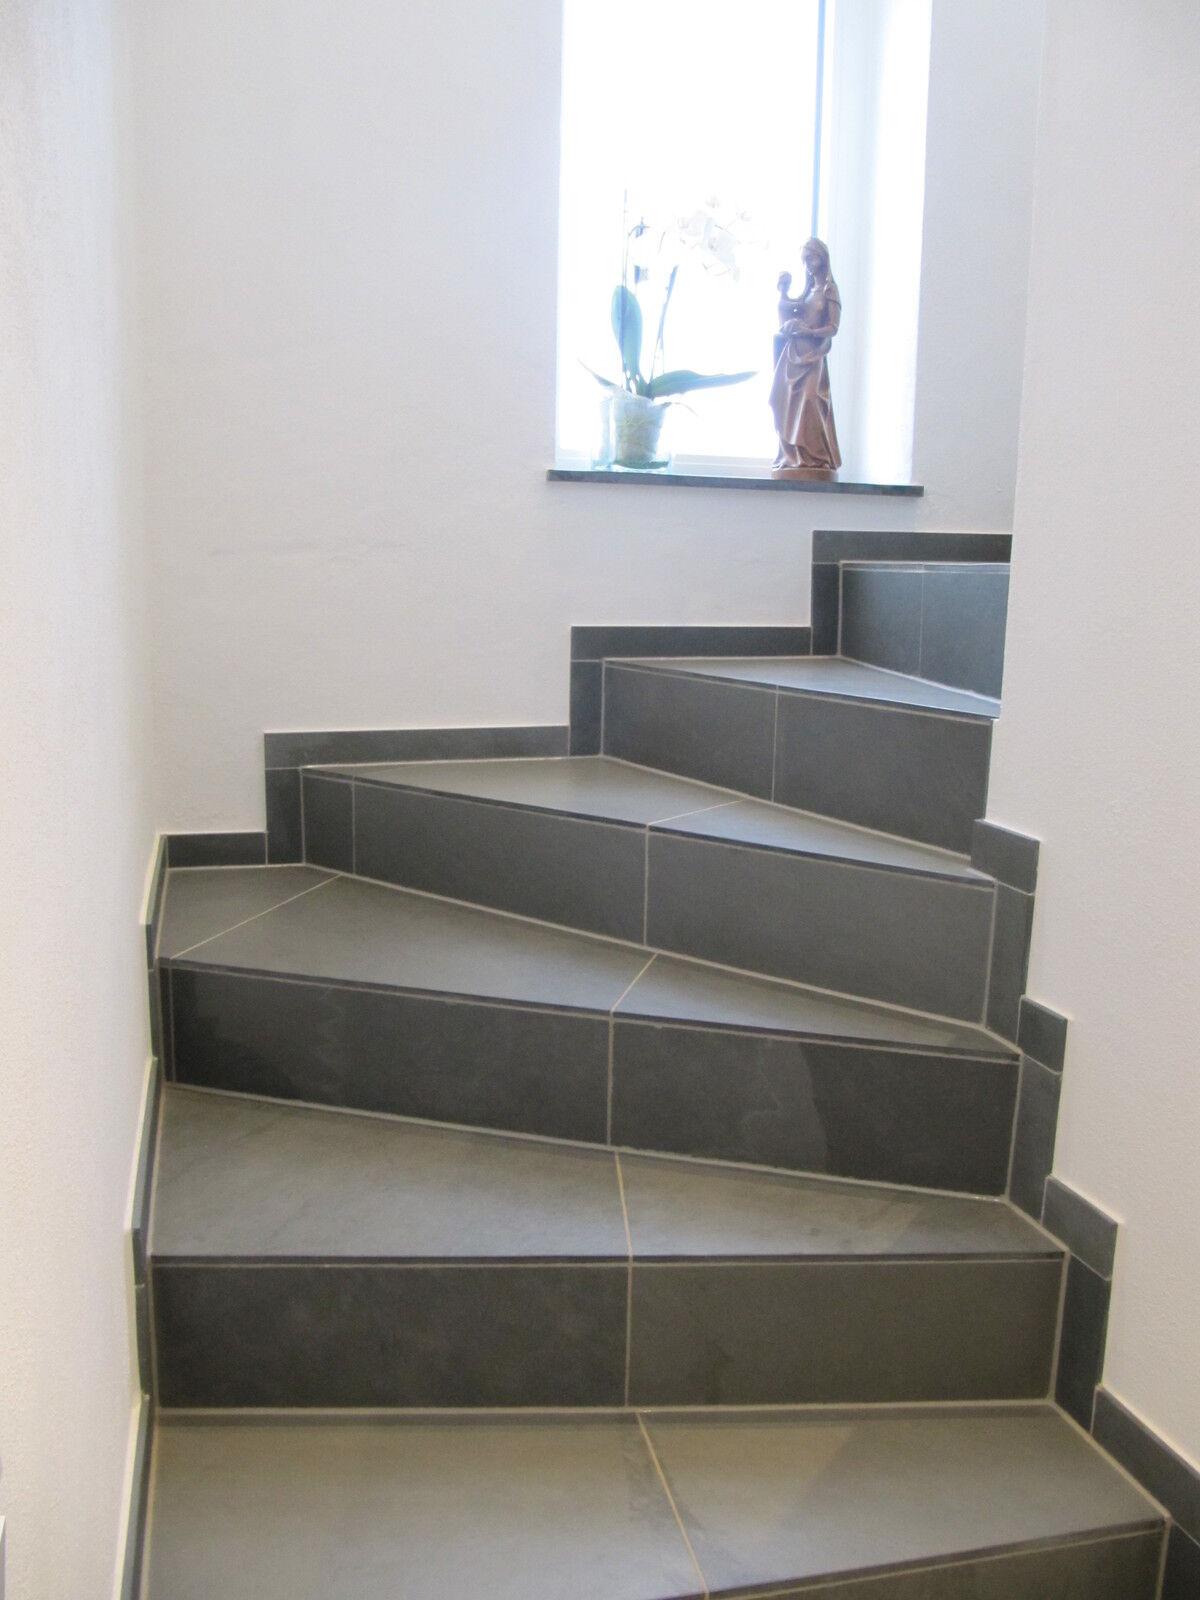 schiefer gris grau bodenplatten schieferfliesen. Black Bedroom Furniture Sets. Home Design Ideas